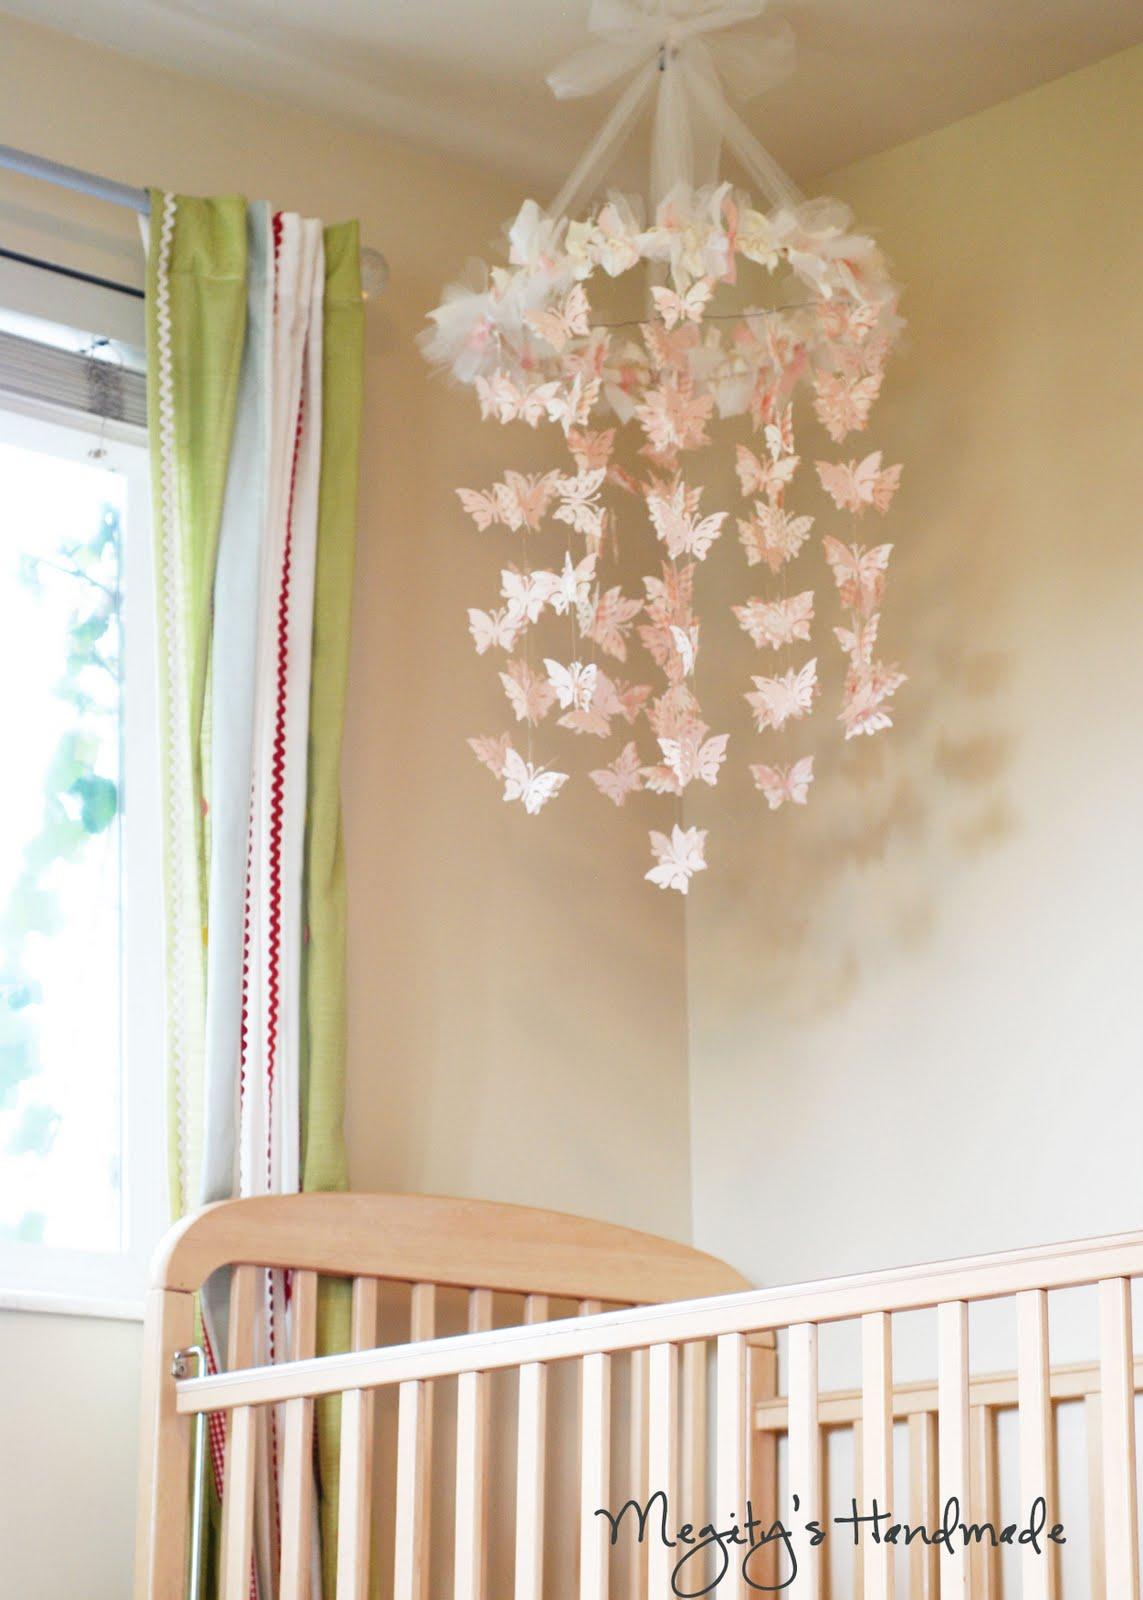 A butterfly chandelier megitys handmade oopsey daisy arubaitofo Gallery